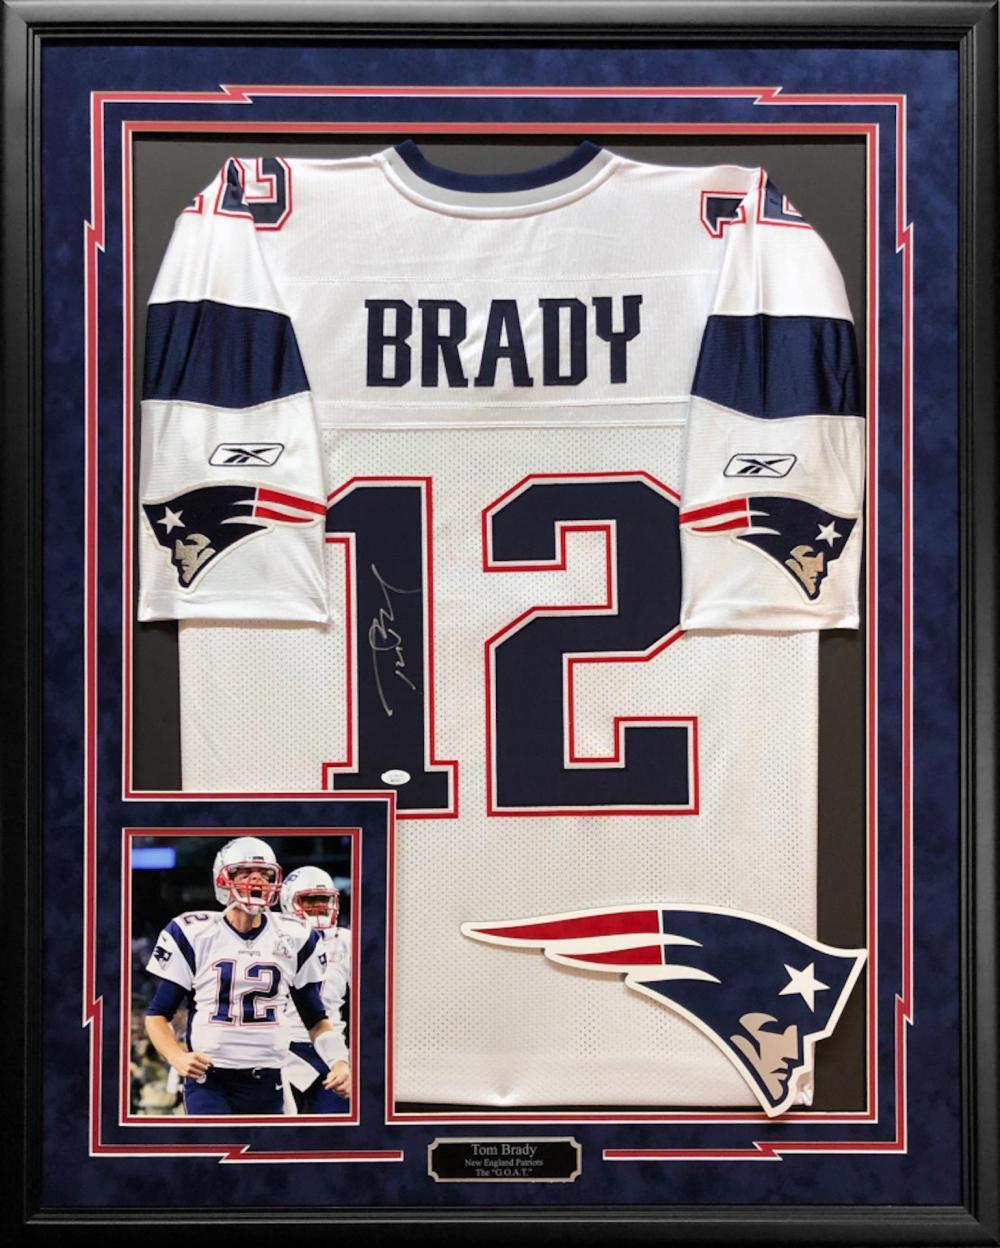 Tom Brady Signed 34.5x42.5 Custom Framed Reebok Jersey (JSA LOA)